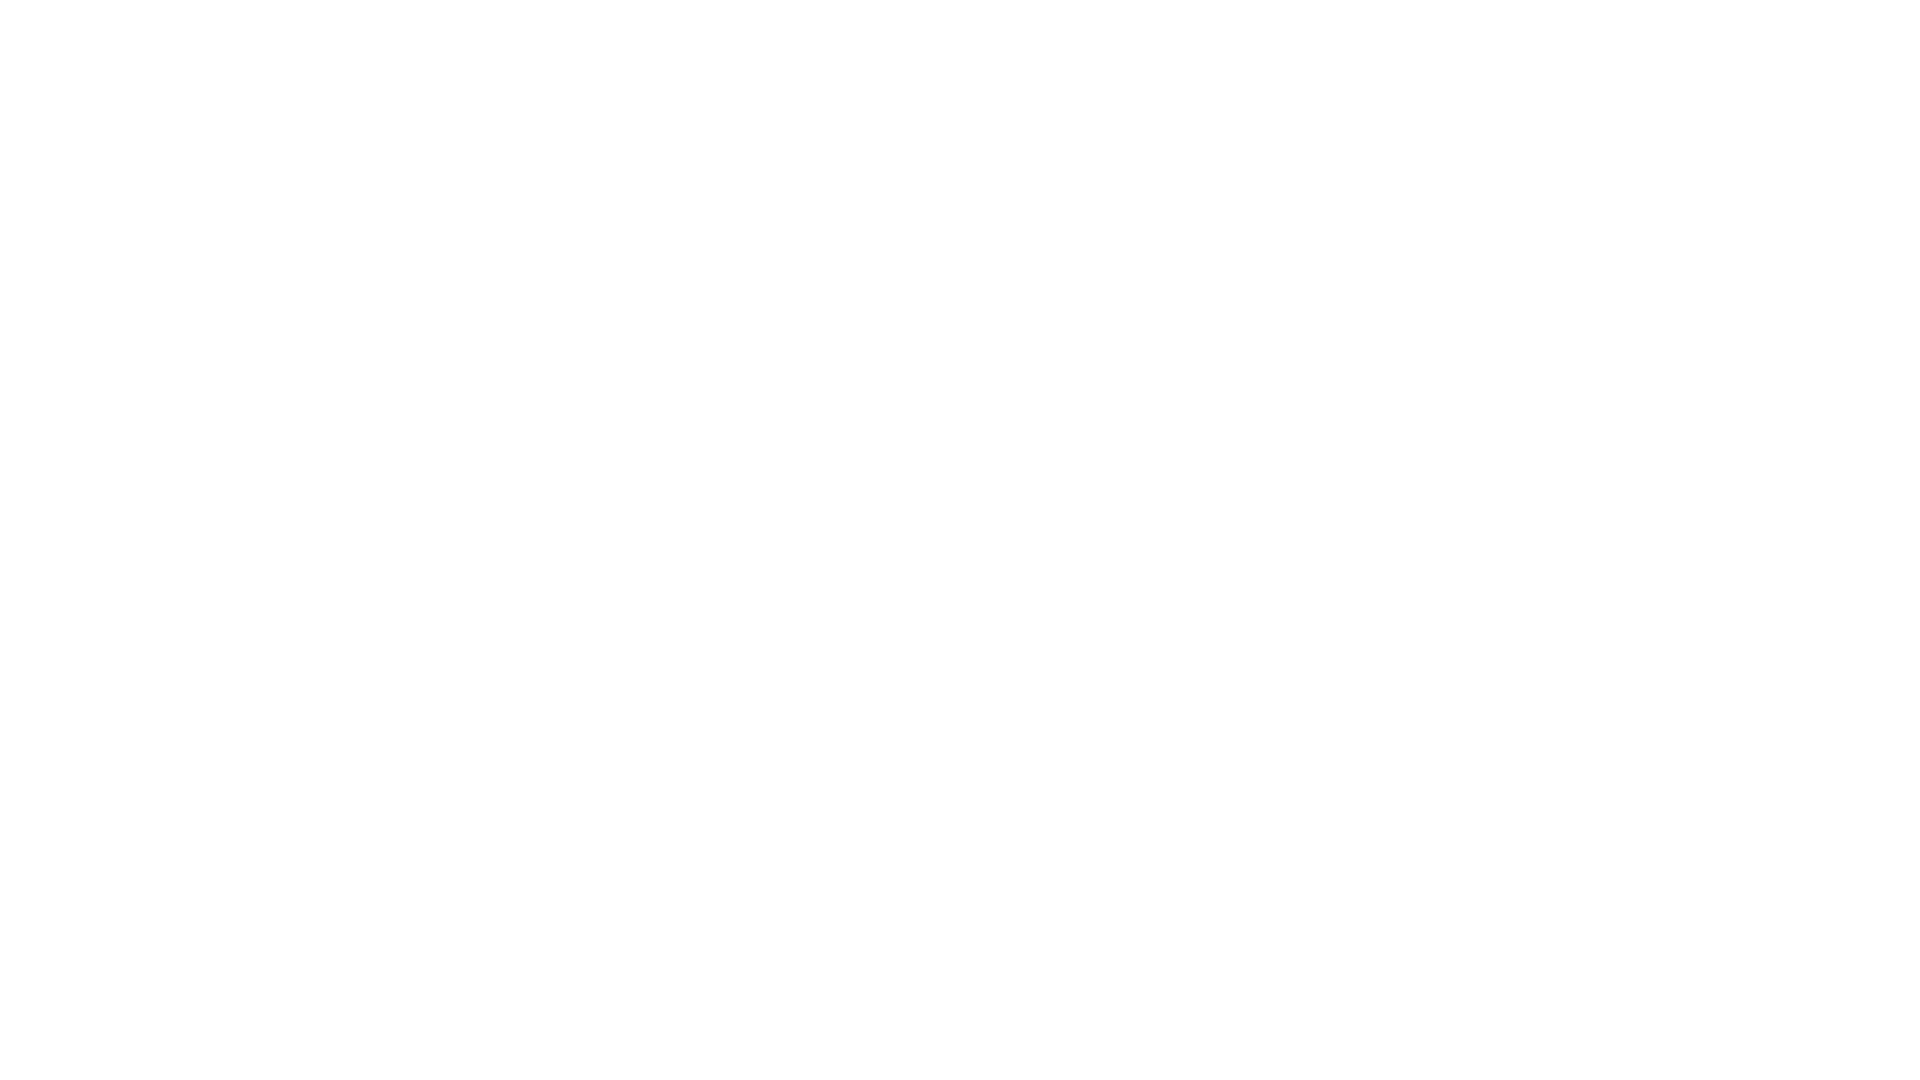 Momentum Backgrounds, Compatible - PC, Mobile, Gadgets| 1920x1080 px